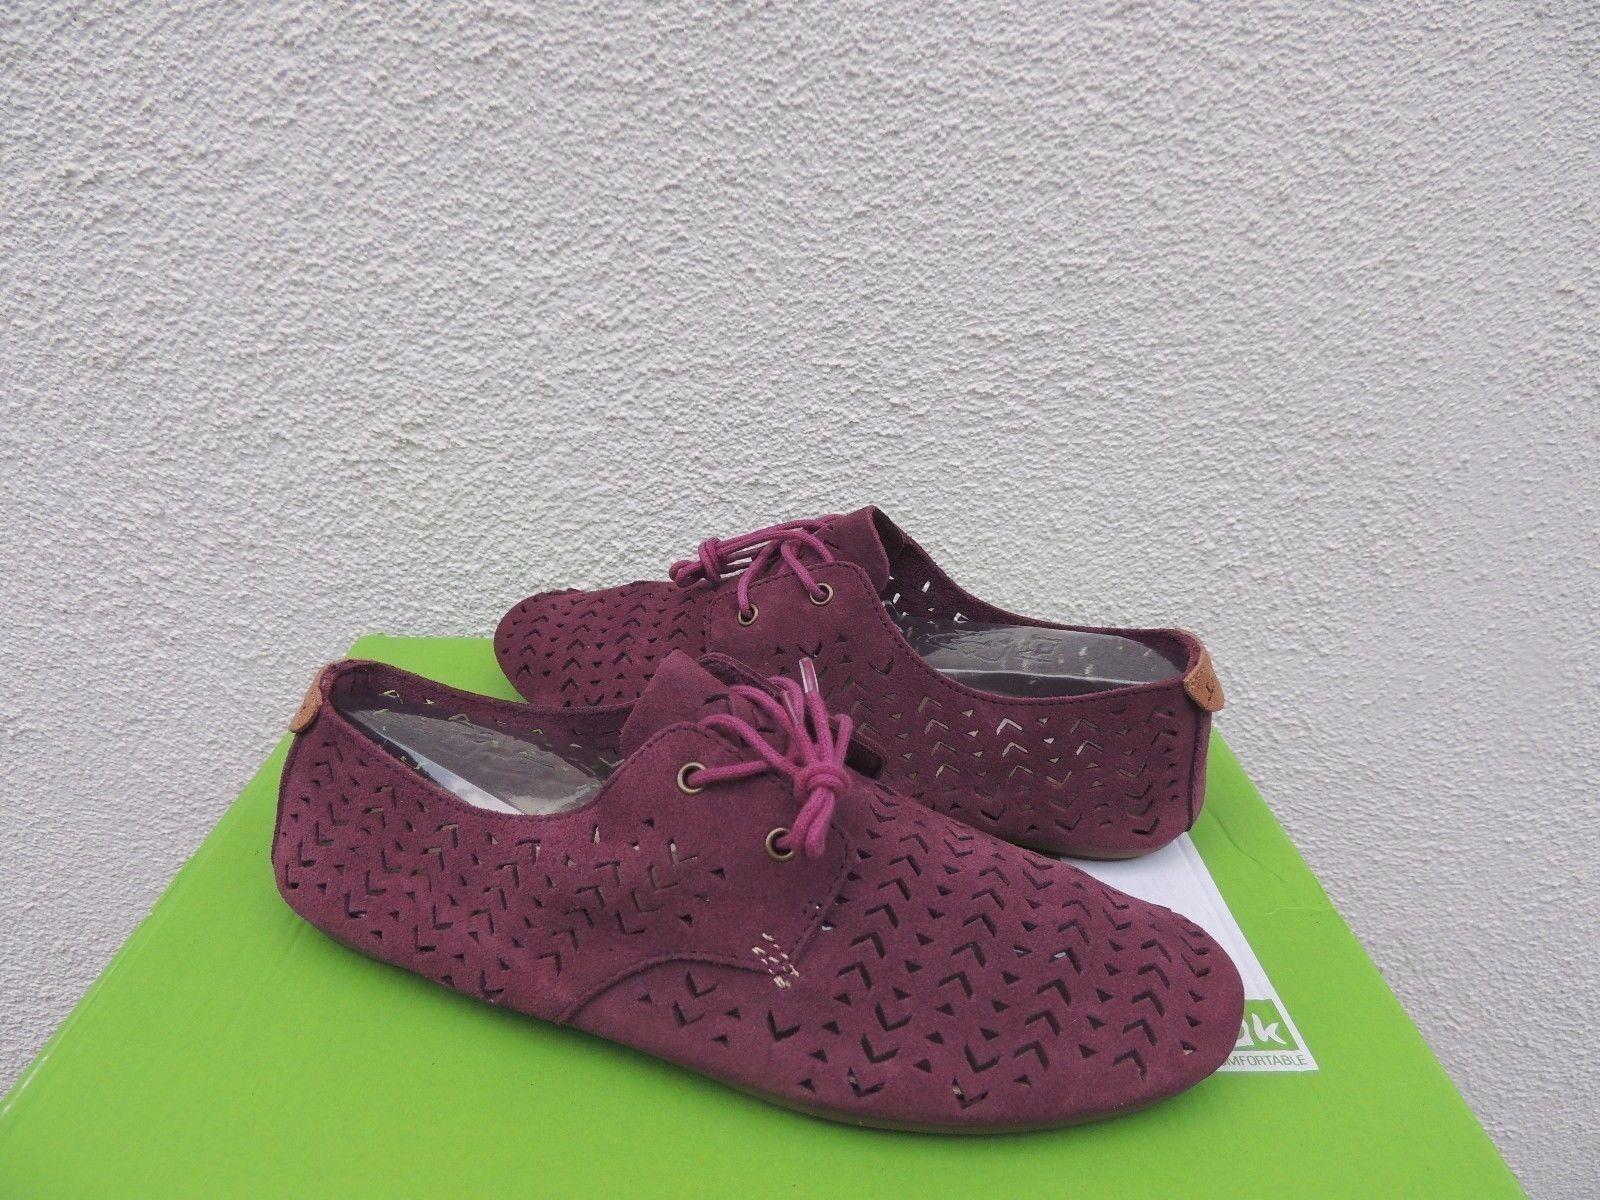 SANUK DUSTY BOYSENBERRY SUEDE BIANCA PERF BALLET FLATS Schuhe, NWT US 7/ EUR 38 NWT Schuhe, f04b46